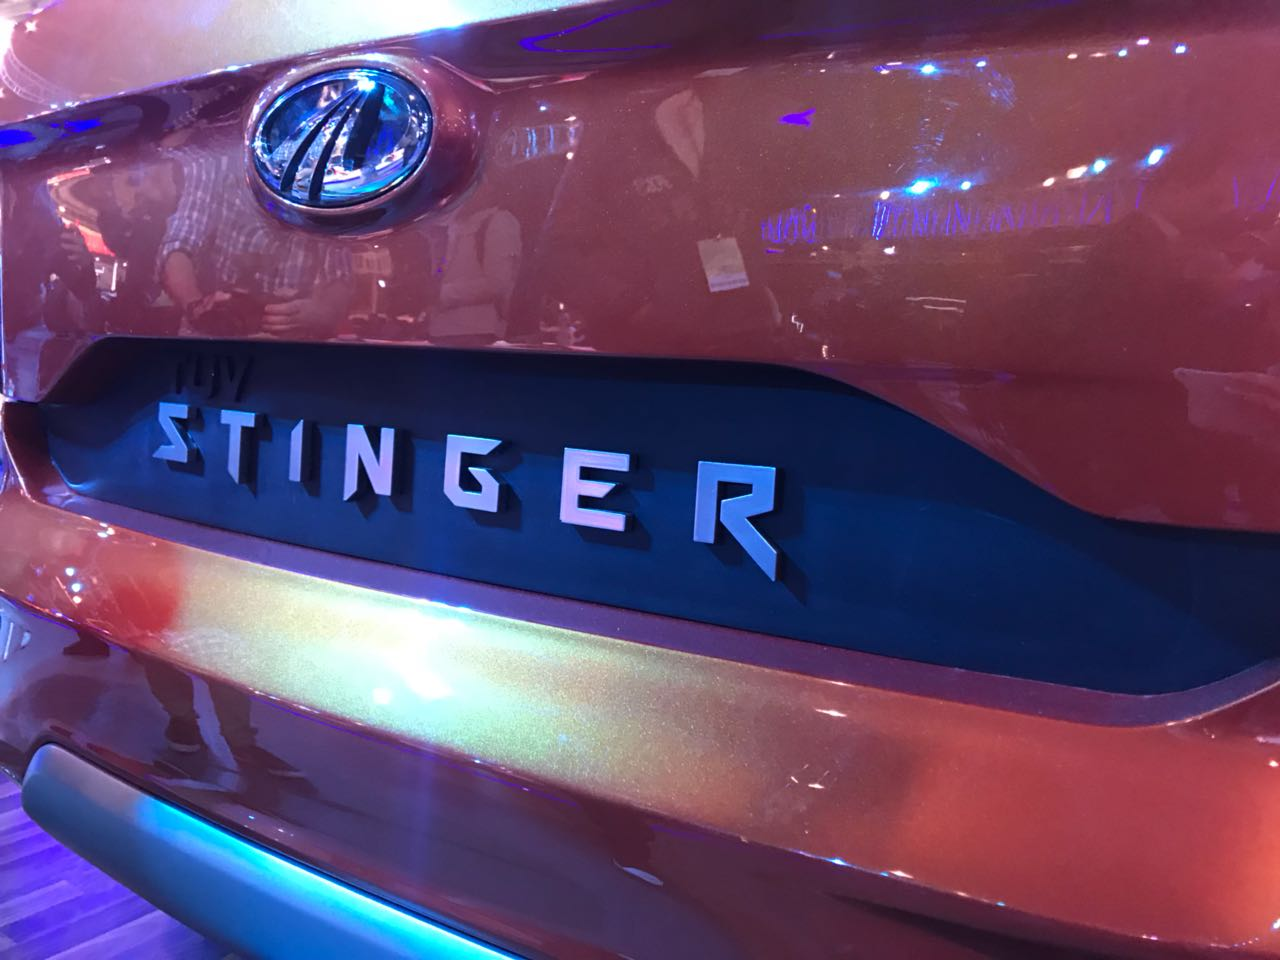 <p>The Mahindra Stinger details and interiors</p>